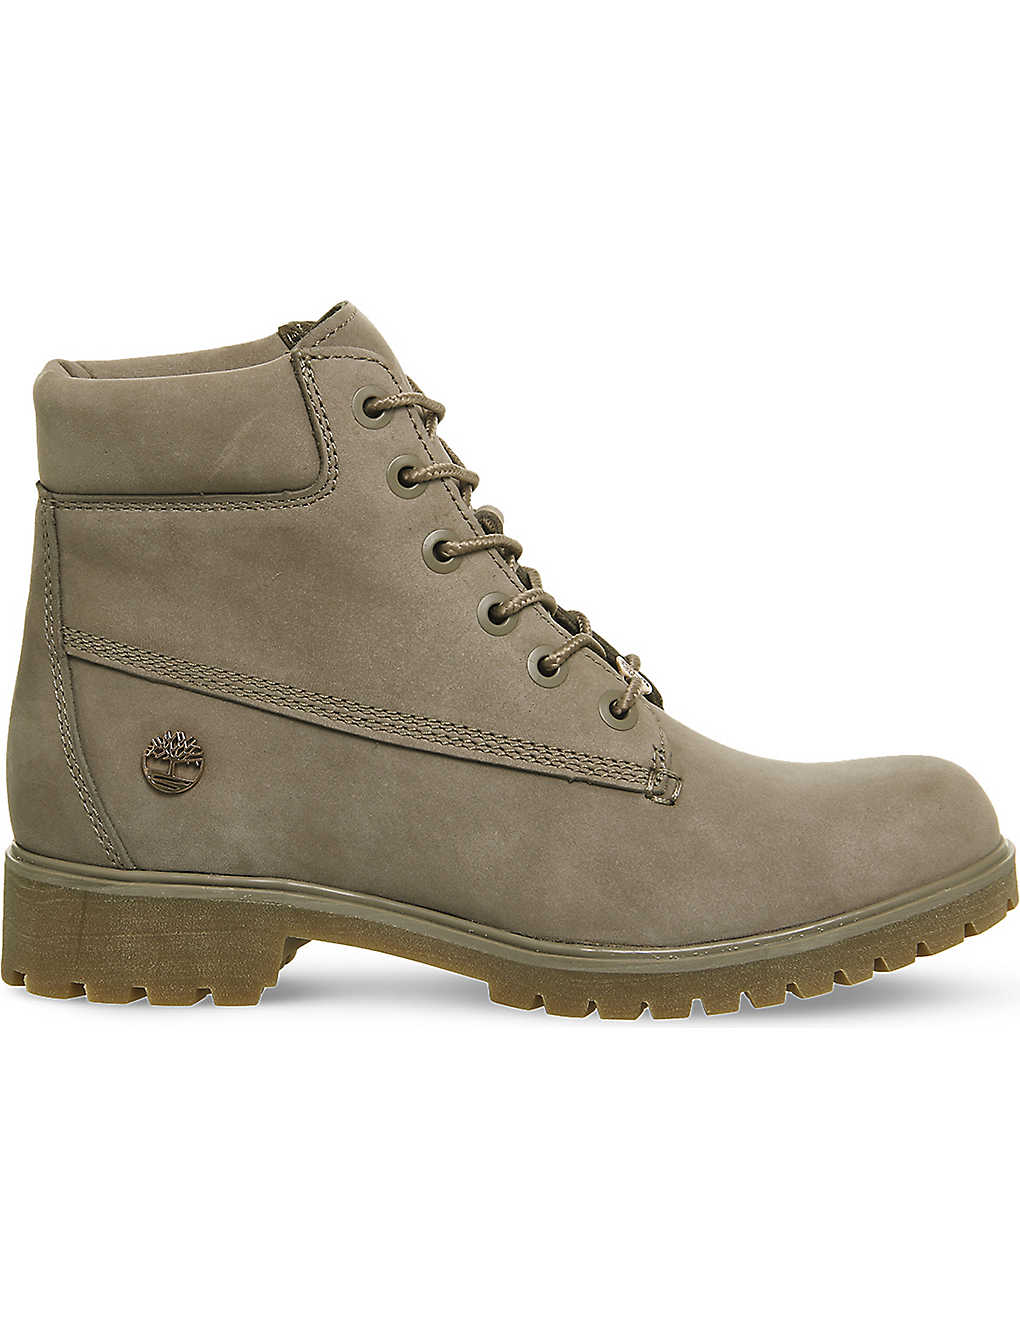 23a54fab83 TIMBERLAND - Slim 6-inch leather boots | Selfridges.com